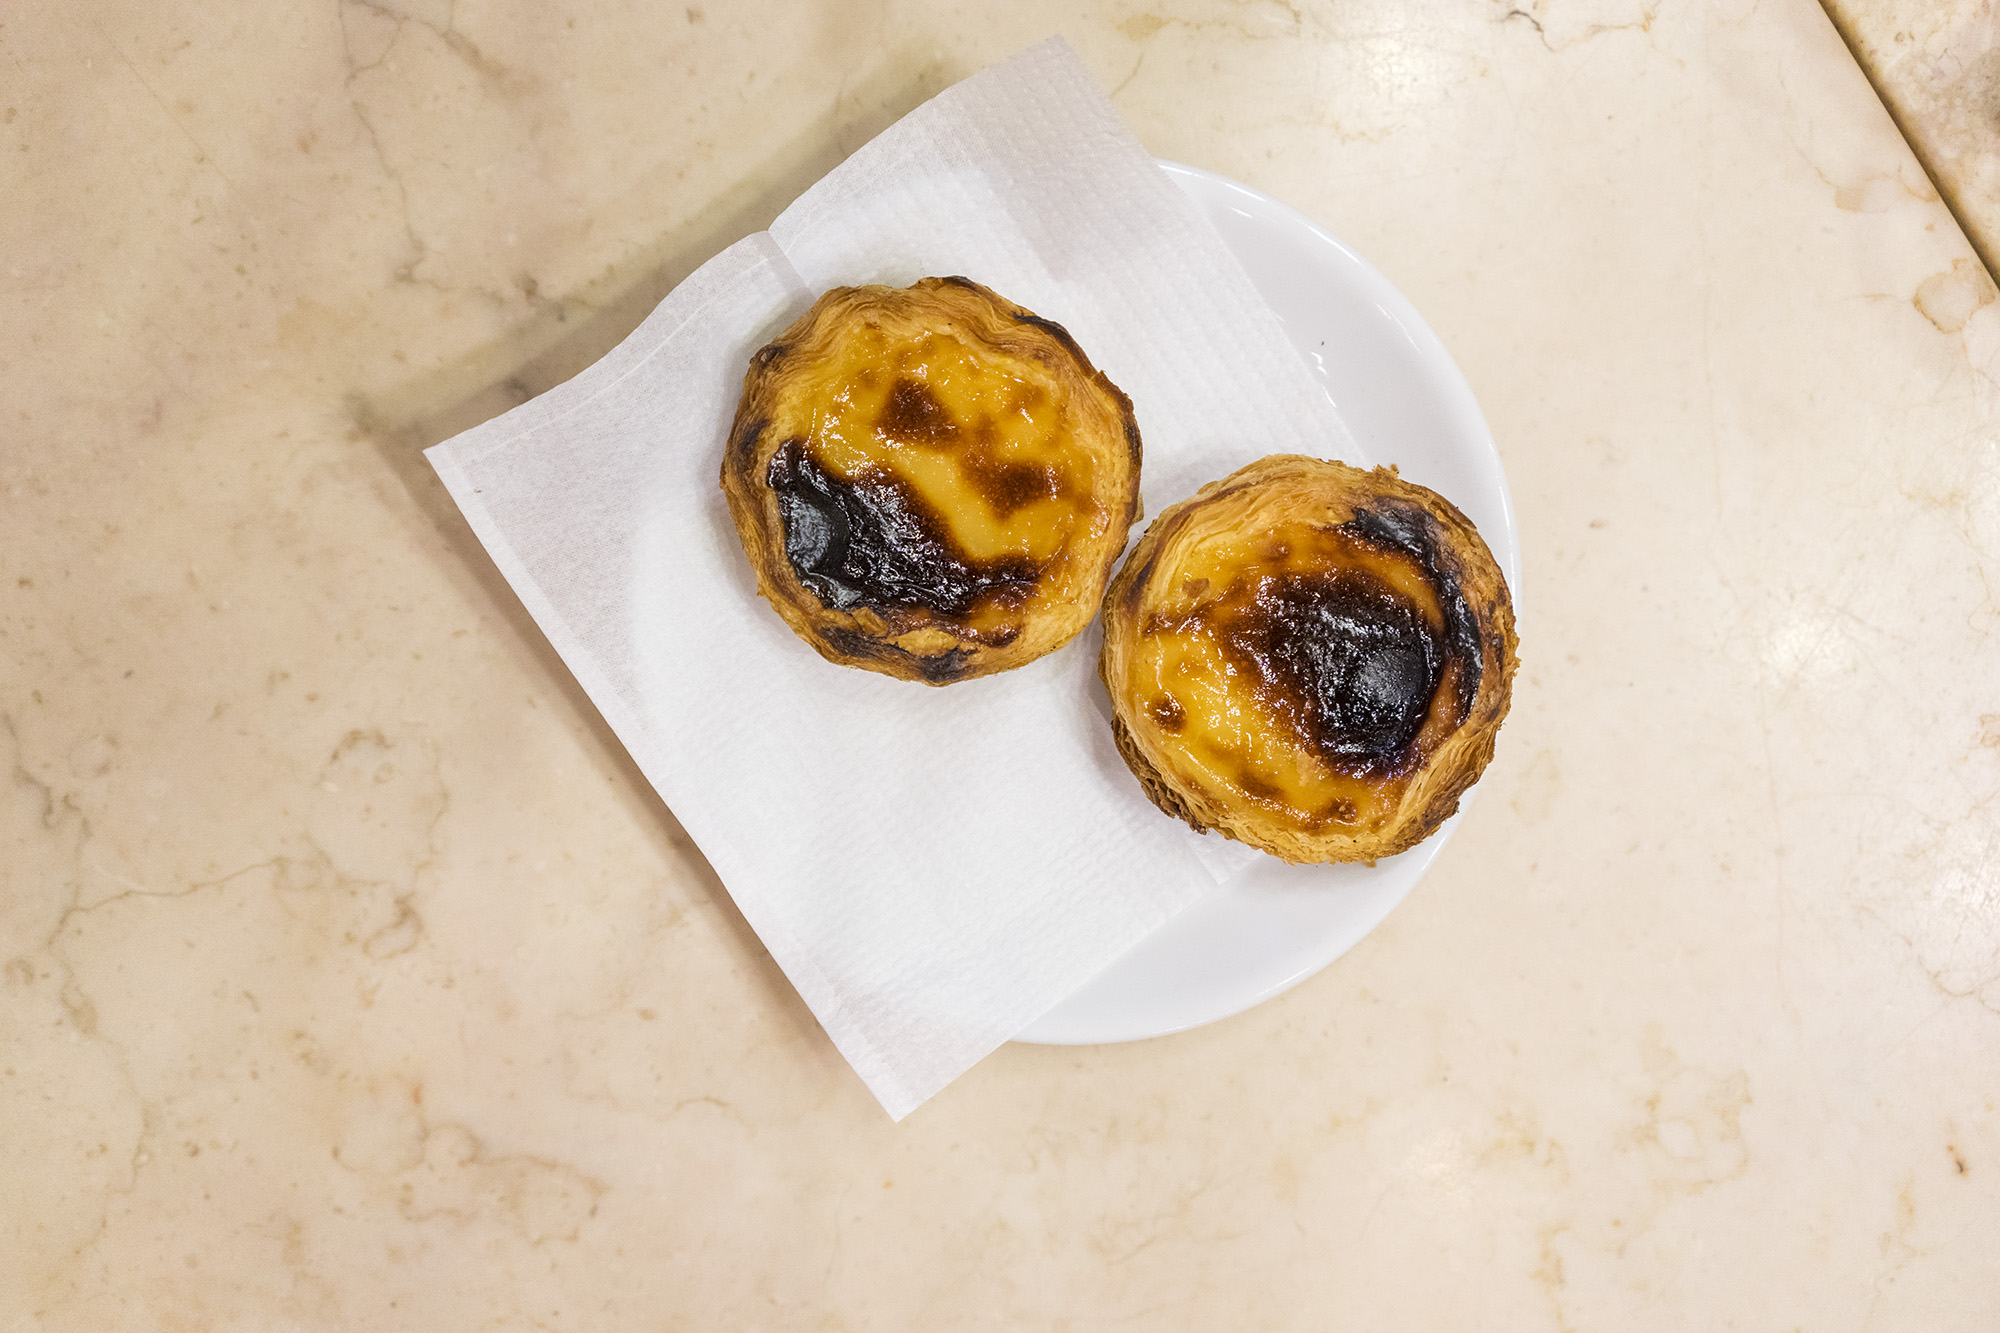 Pastel de natas at  A Brasileira